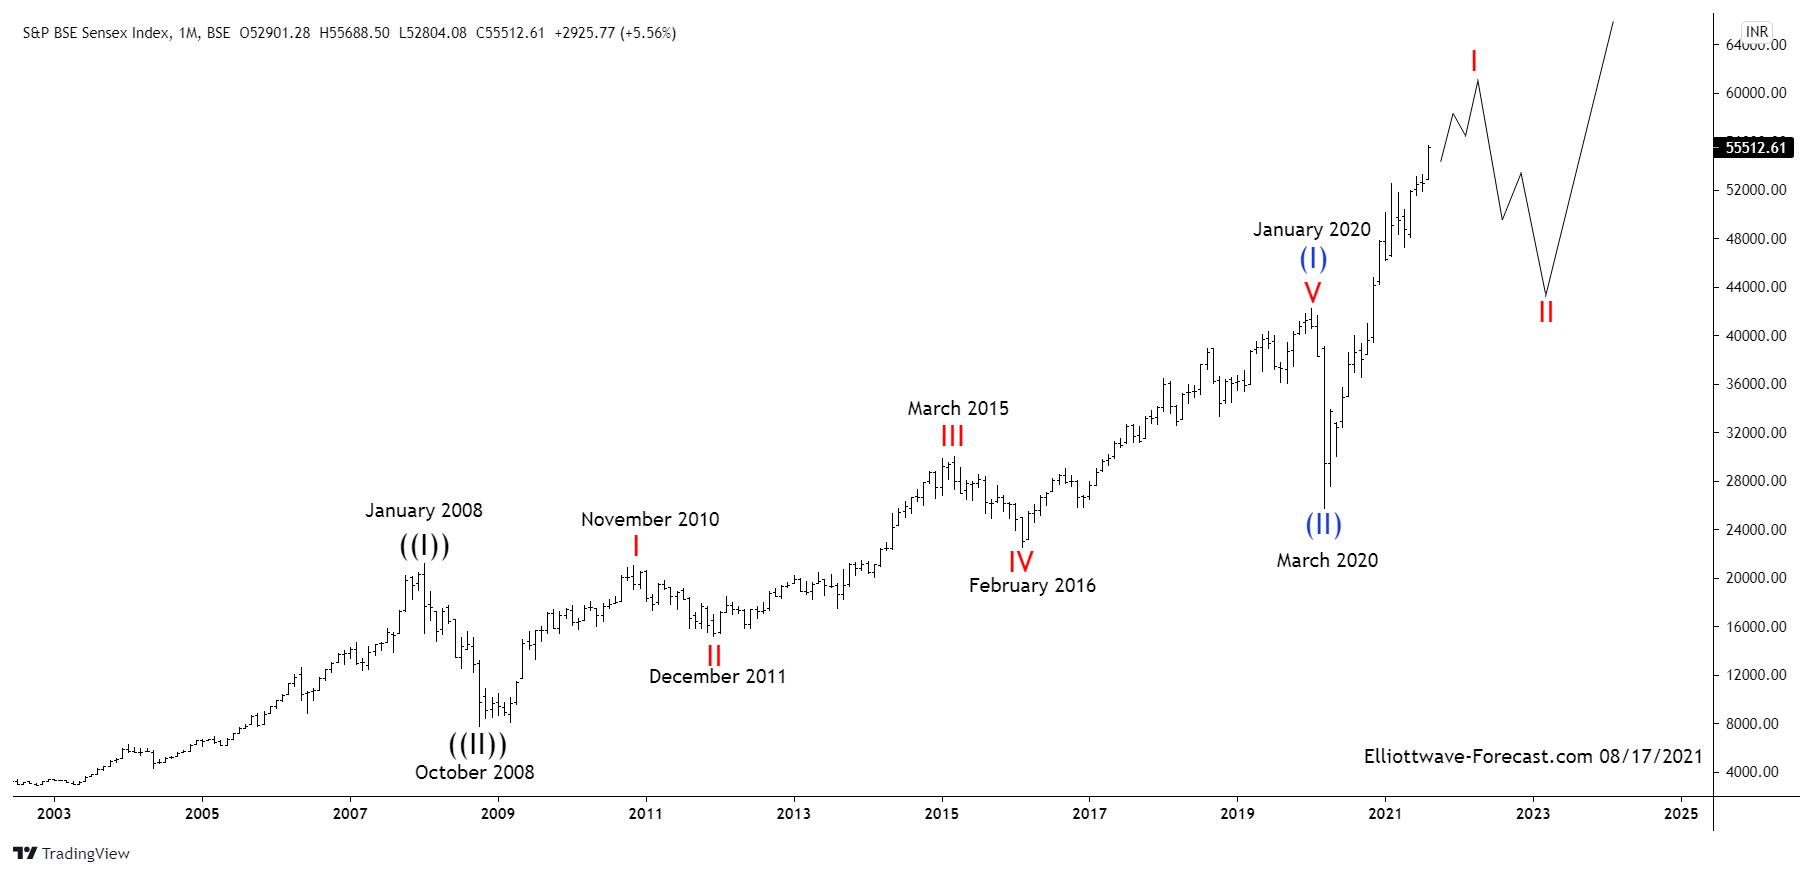 S&P BSE Sensex Index Long Term Elliott Wave & Bullish Cycles